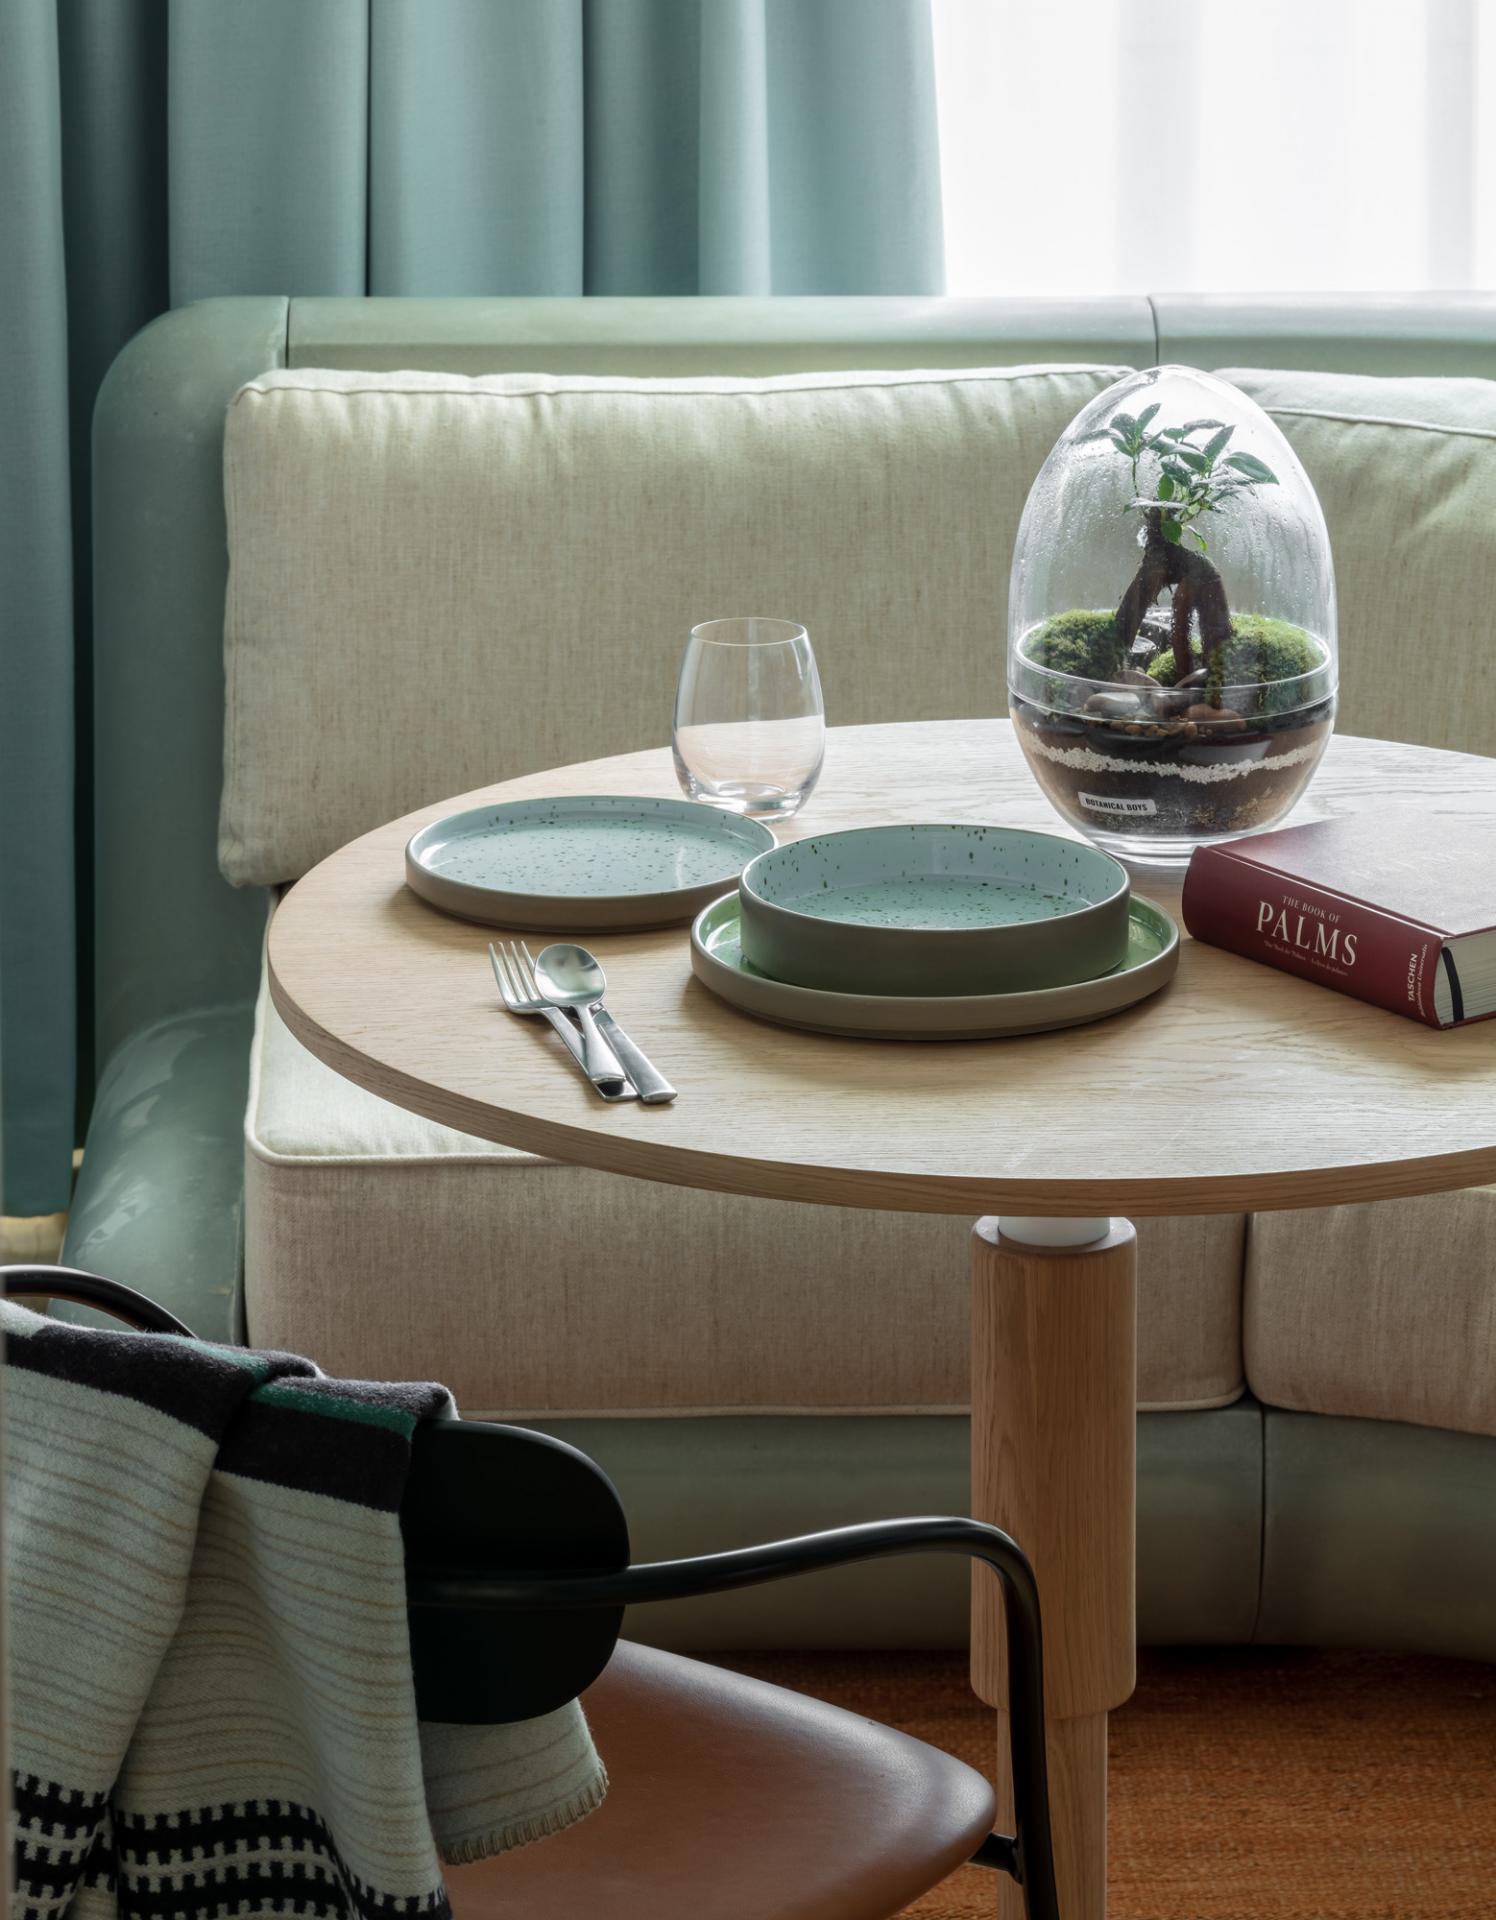 Table at Bermonds Locke, St Saviours Estate, London